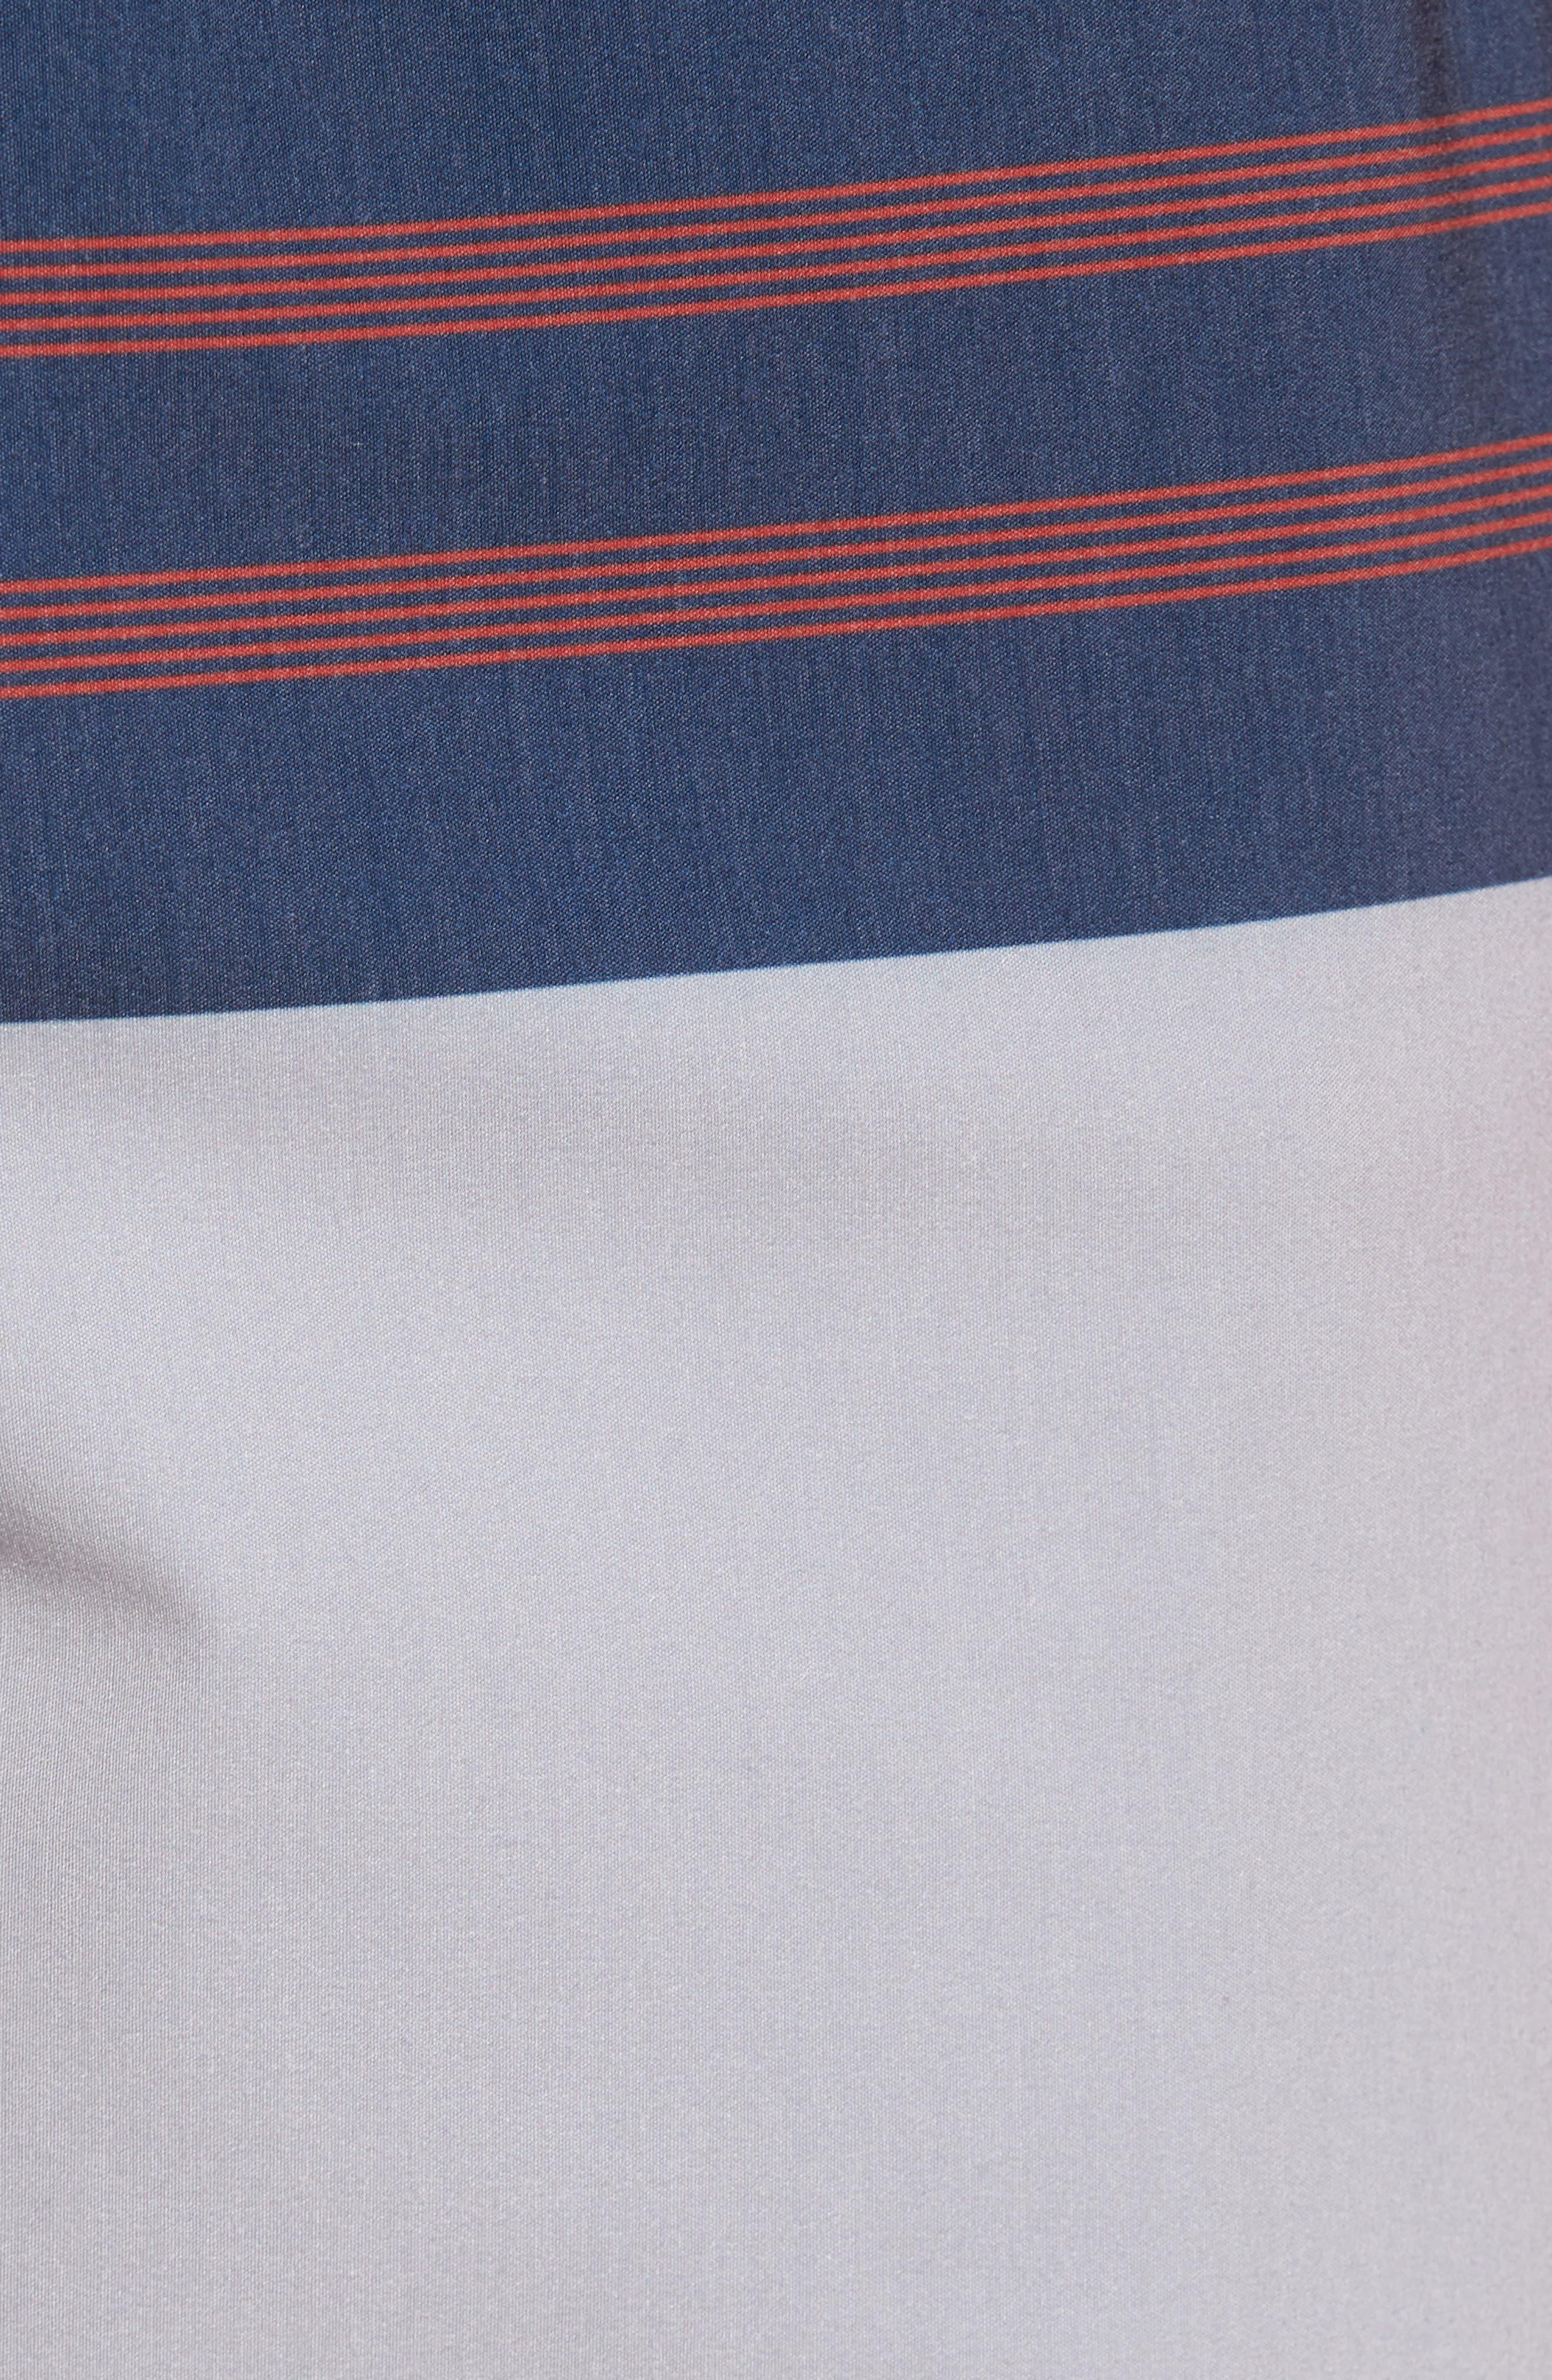 Pier Board Shorts,                             Alternate thumbnail 14, color,